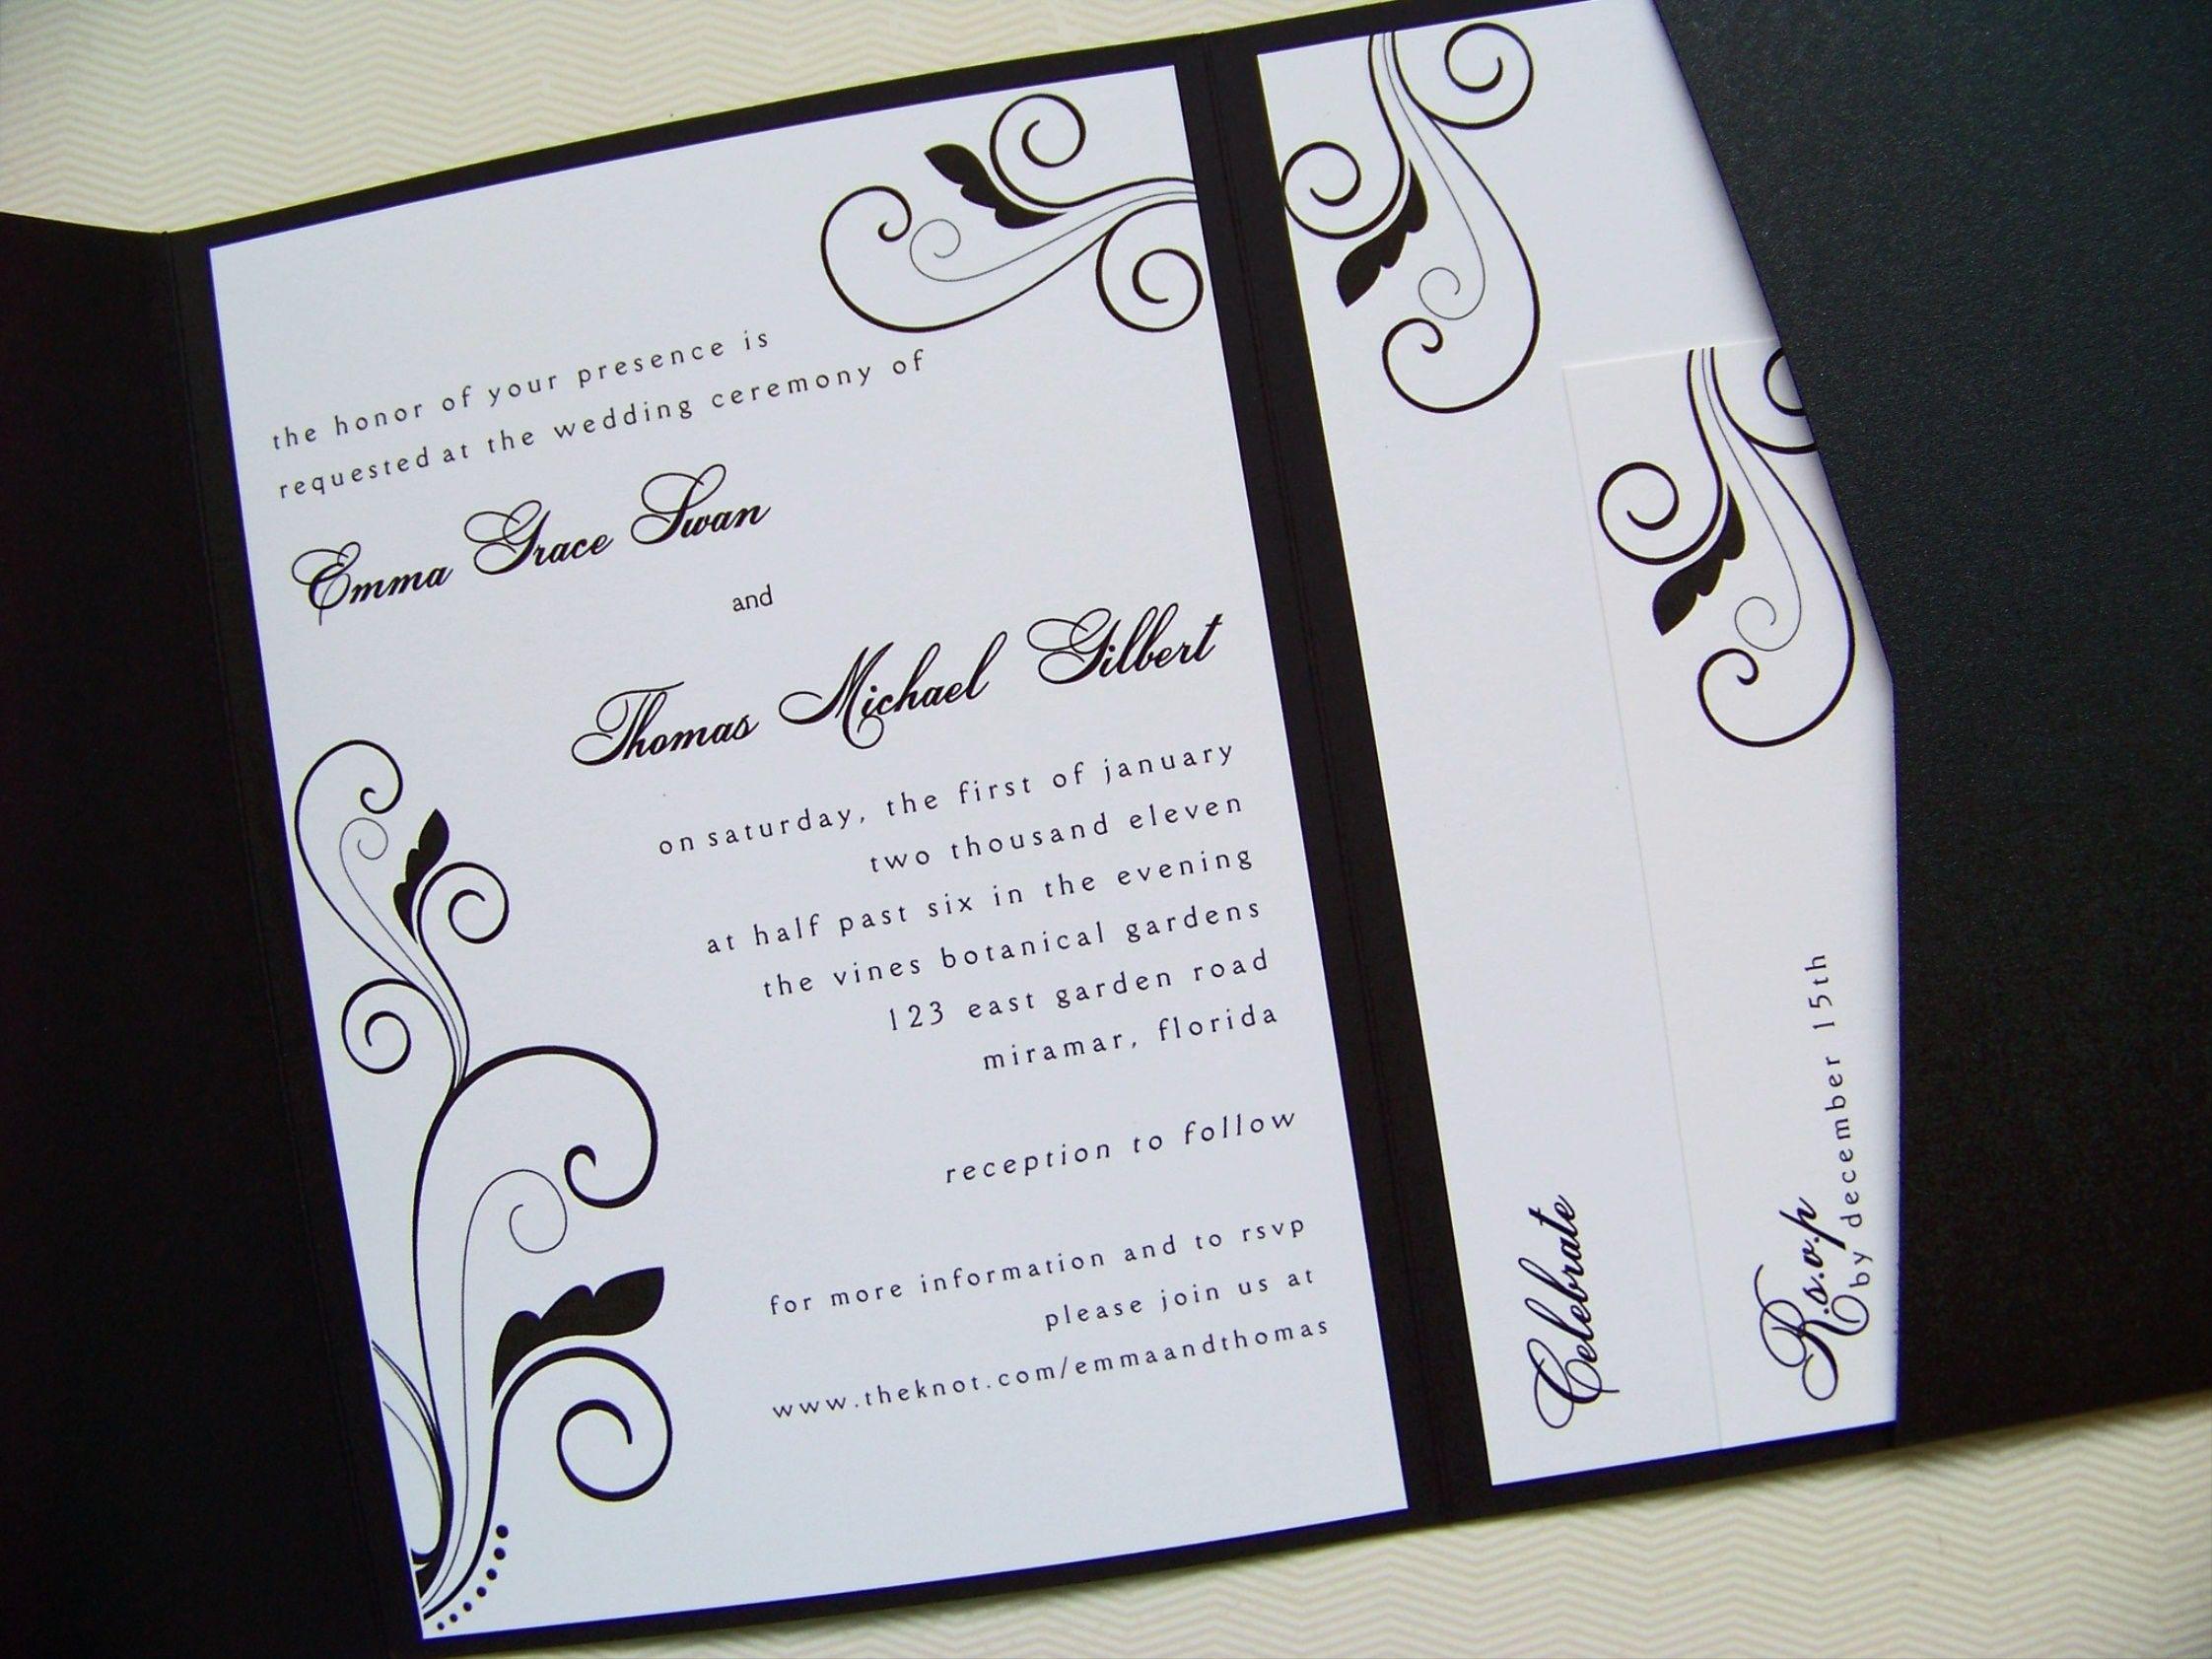 Some tips to make handmade wedding invitation ideas best wedding some tips to make handmade wedding invitation ideas best wedding 2015 2016 http monicamarmolfo Image collections